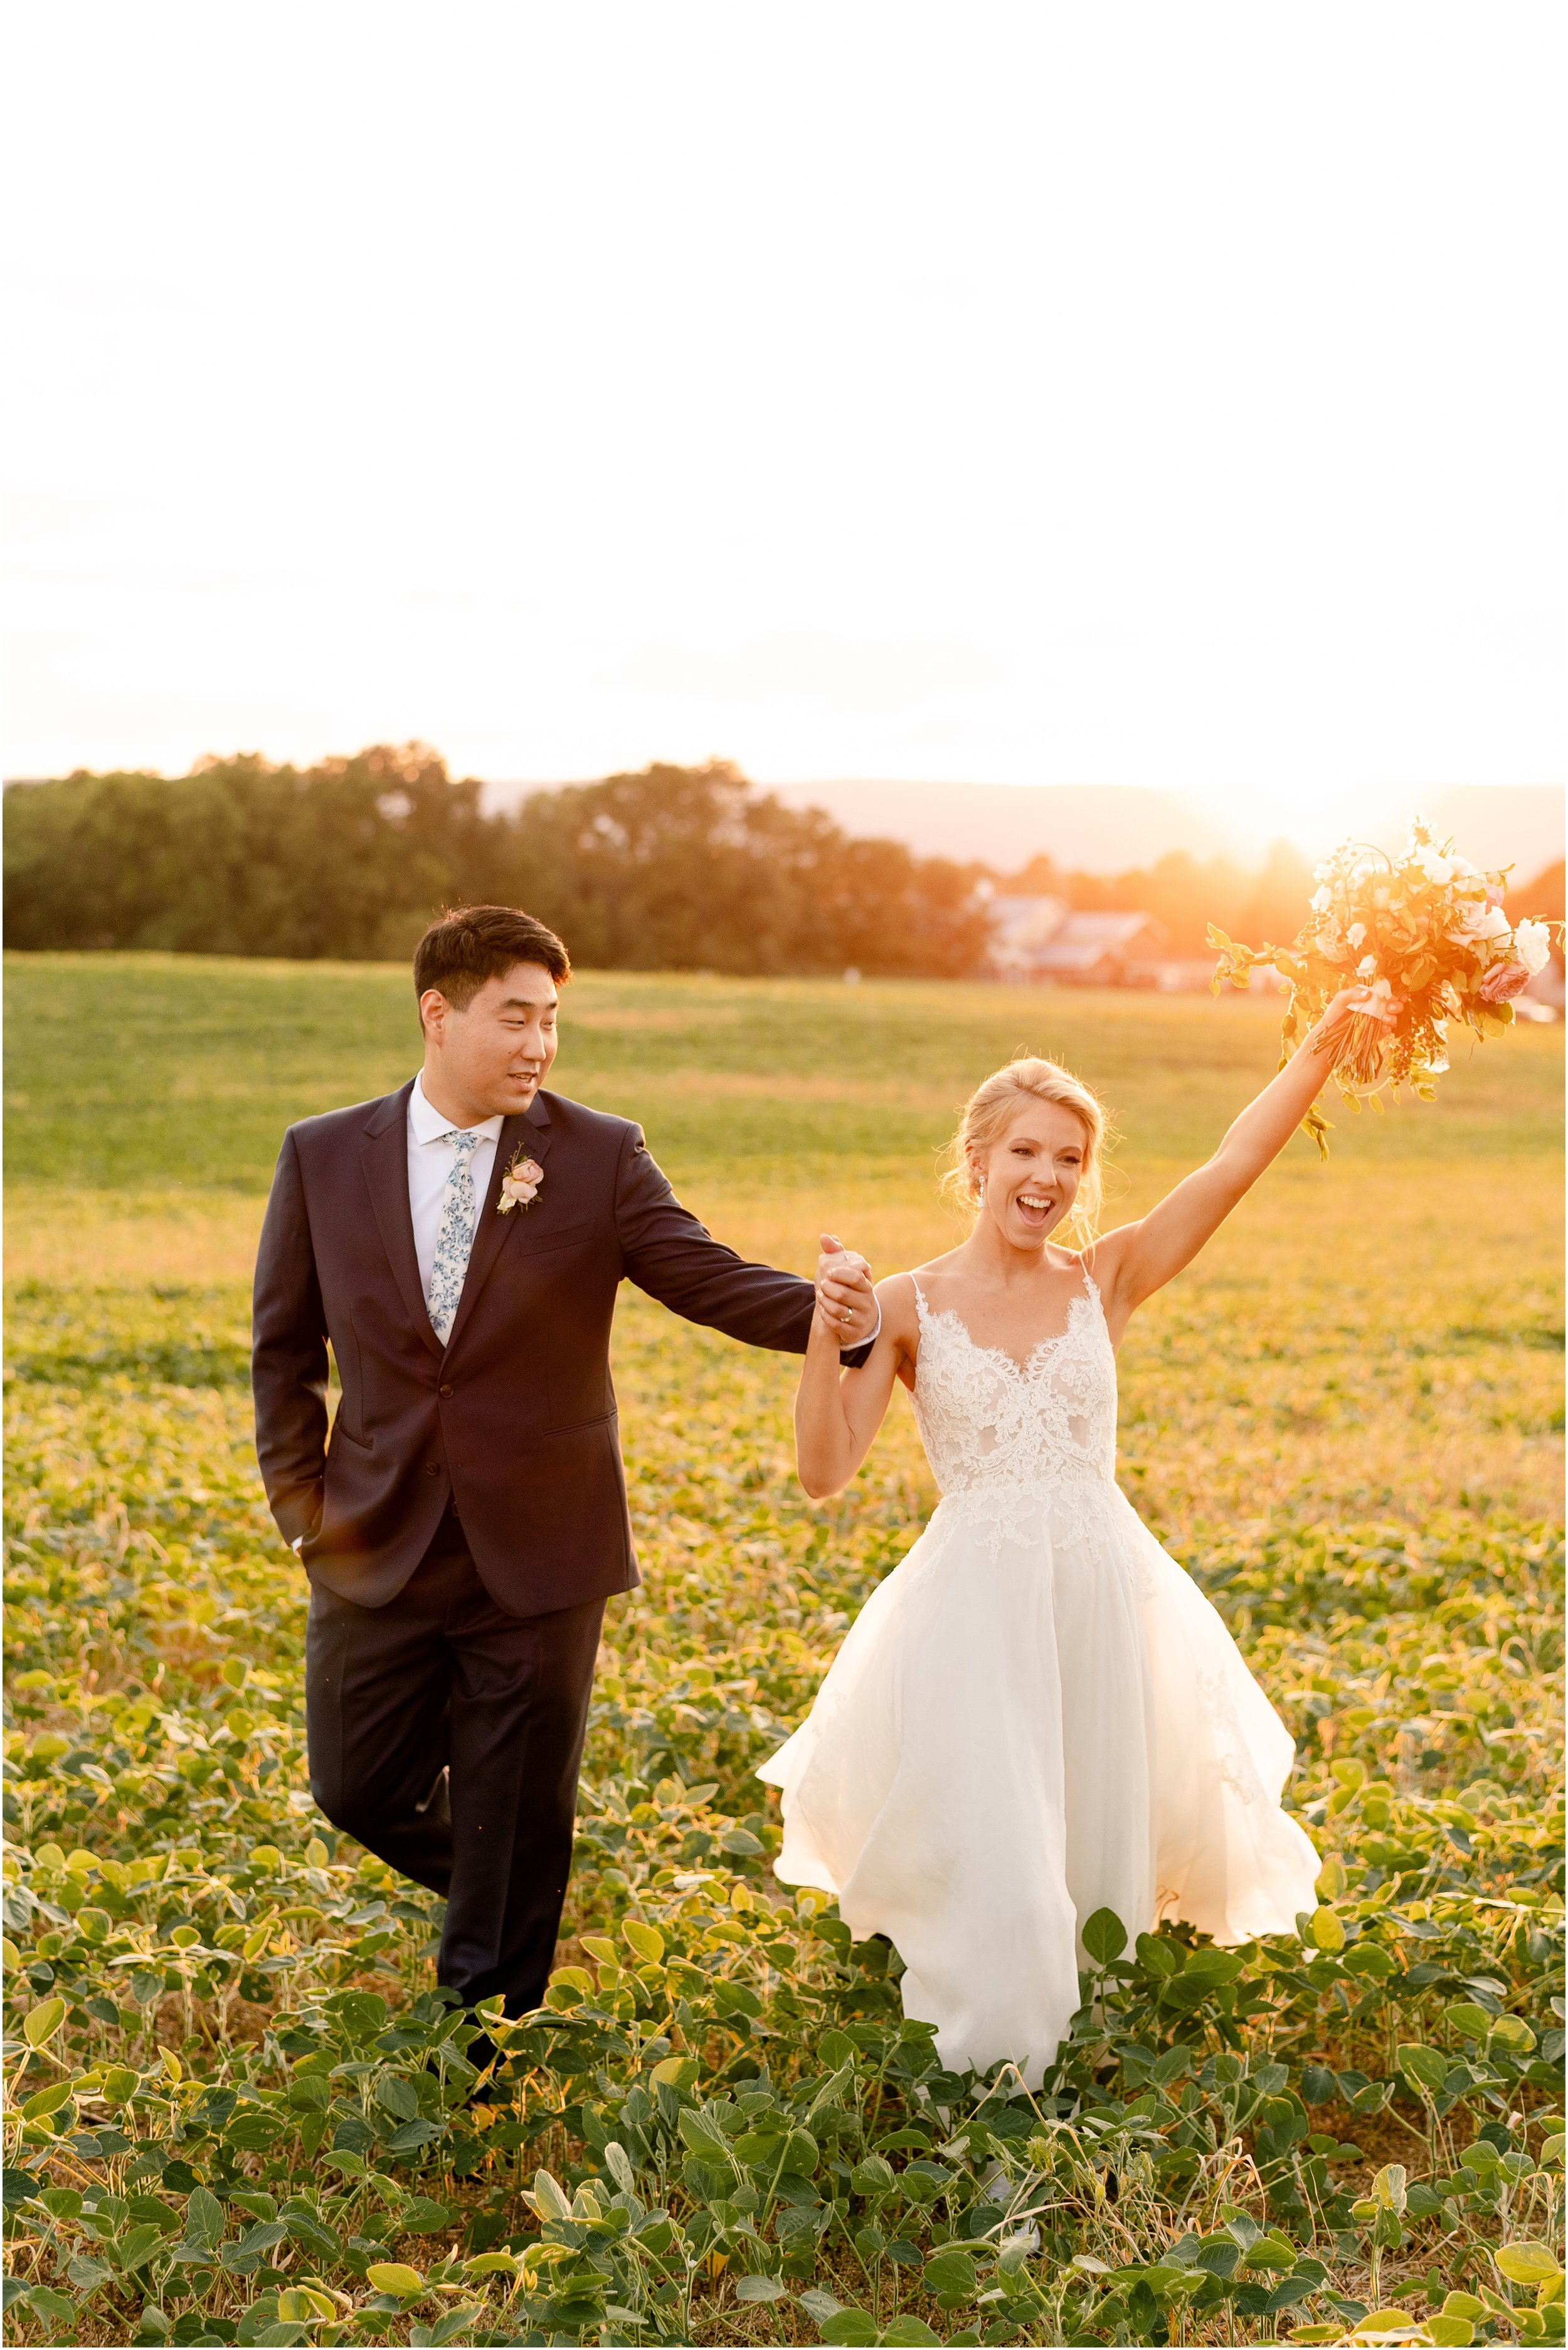 hannah leigh photography Walkers Overlook Wedding Walkersville MD_3570.jpg